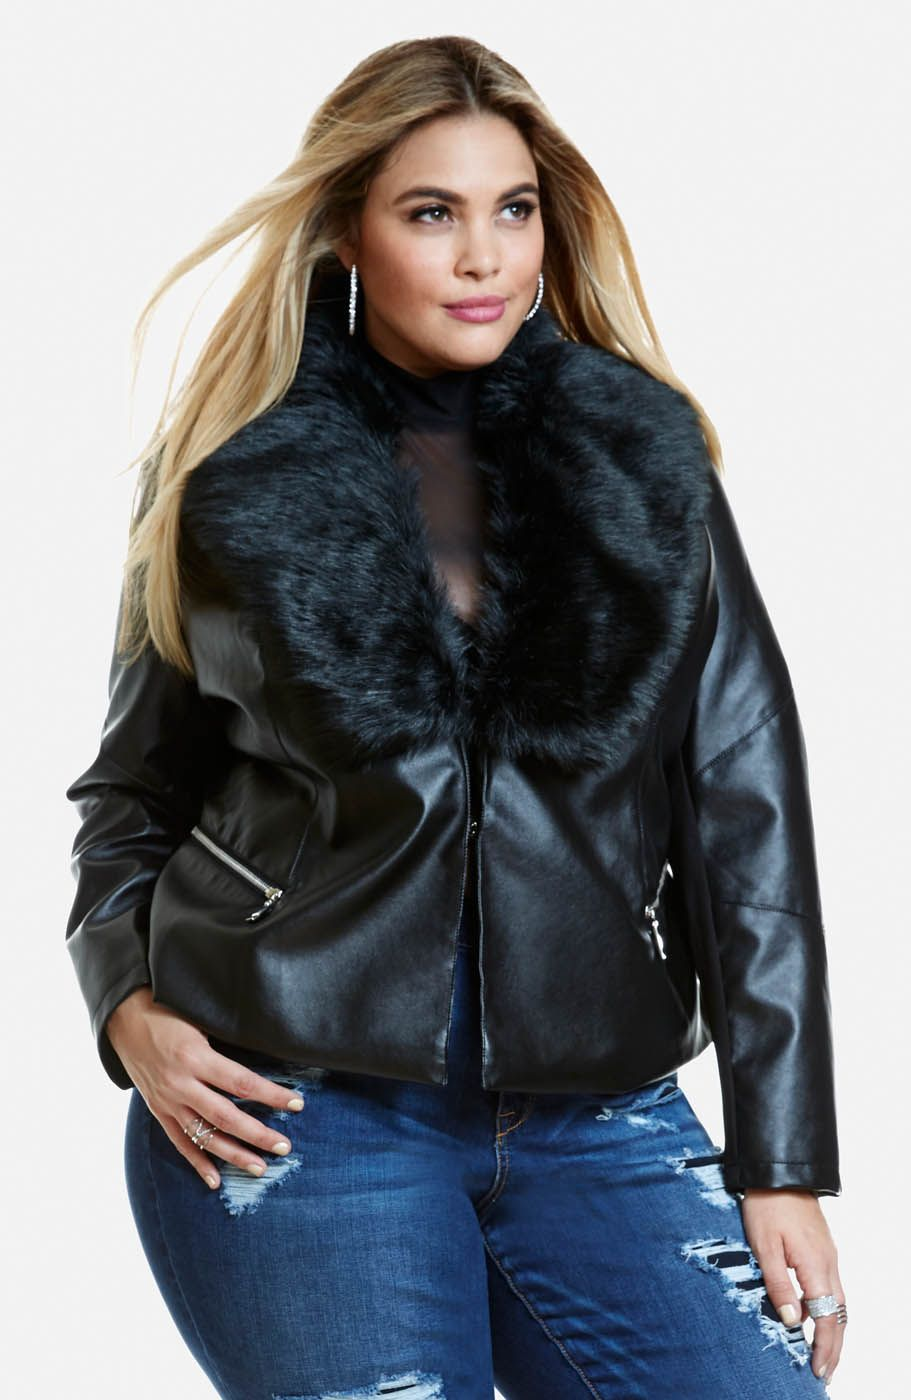 Plus Size Evana Faux Leather Jacket Fashion To Figure Leather Motorcycle Jacket Women Fashion [ 1400 x 911 Pixel ]